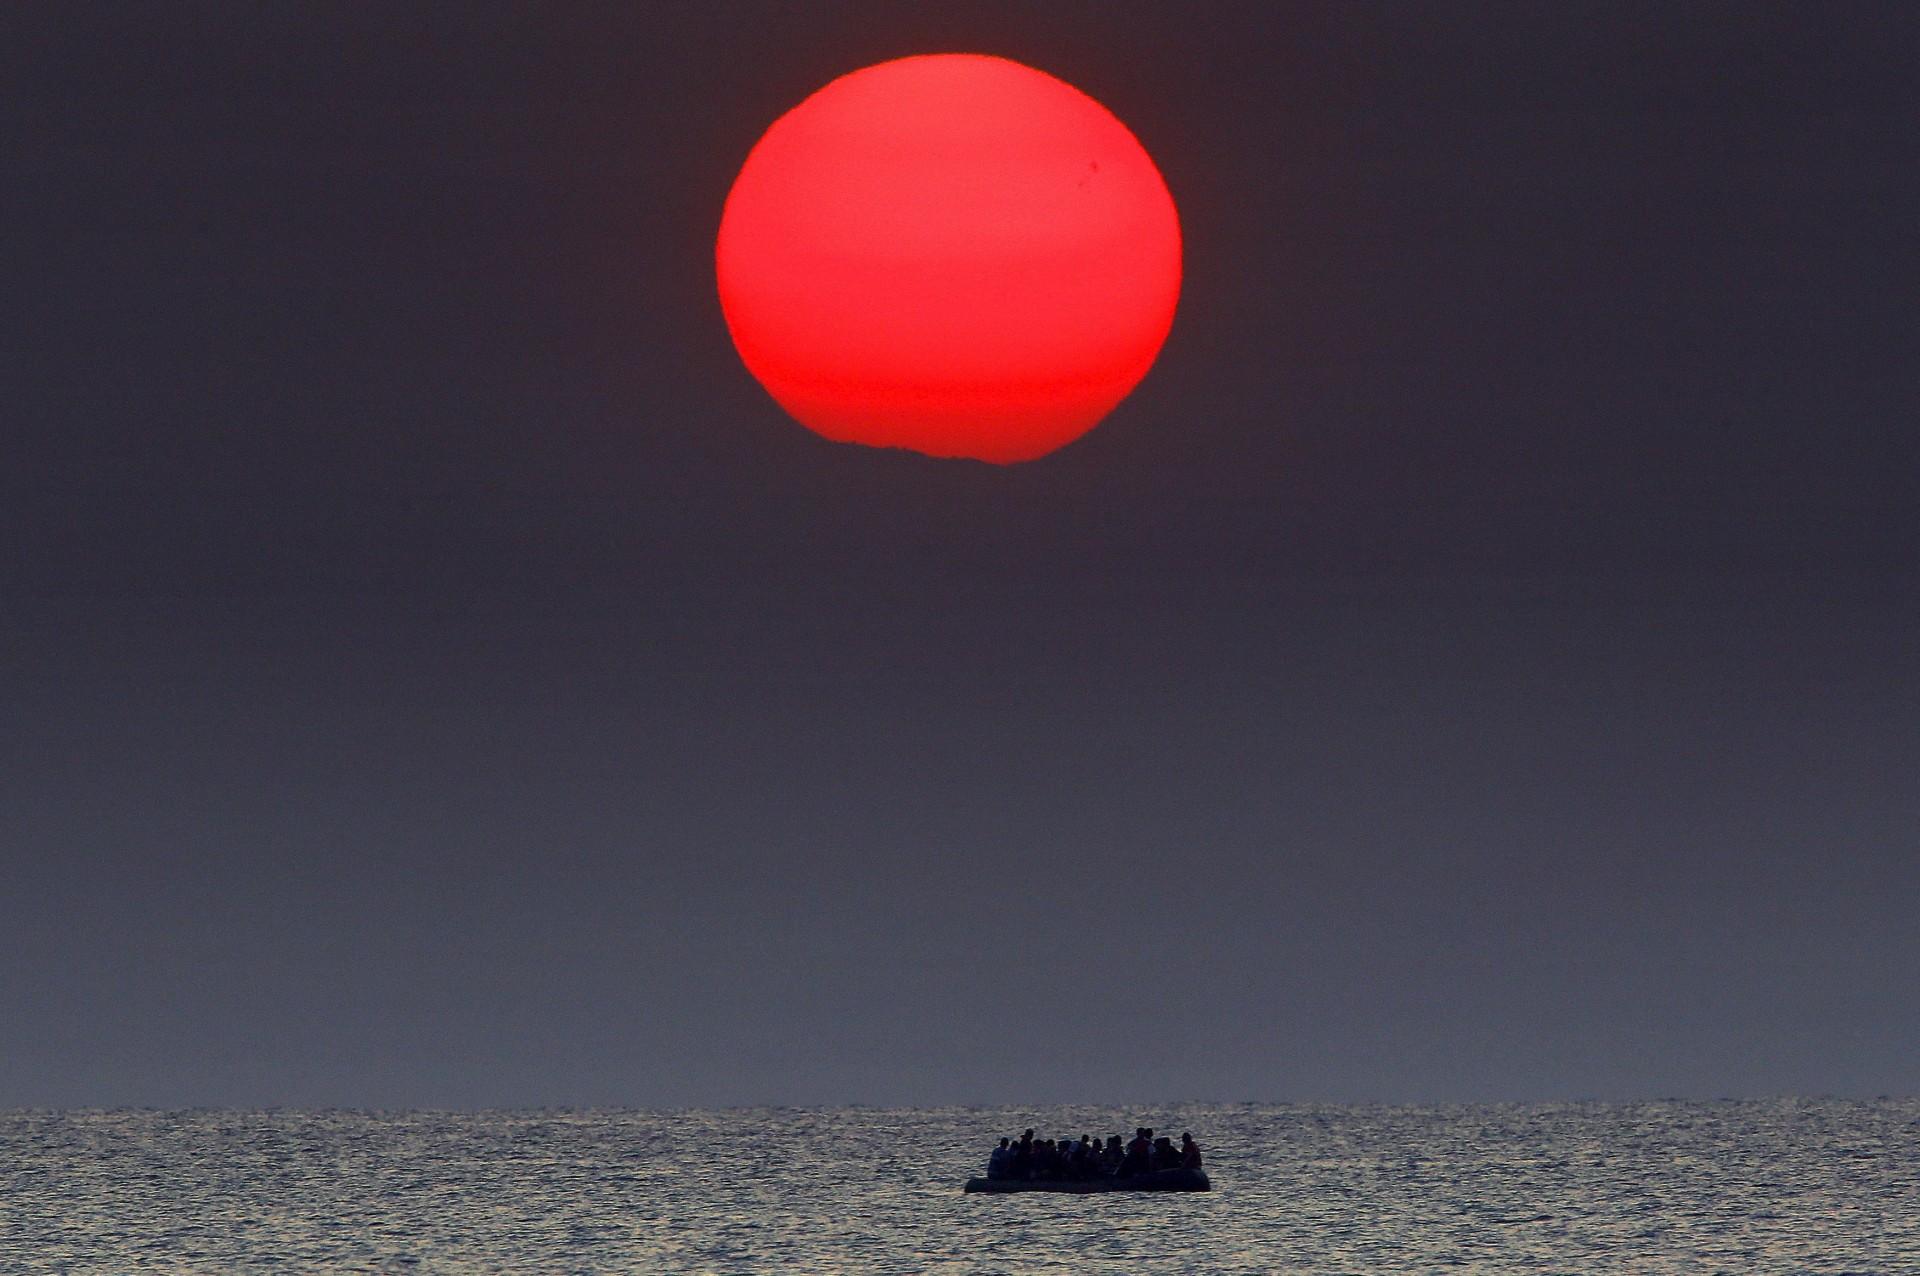 Al largo di Kos, Grecia (REUTERS/Yannis Behrakis)